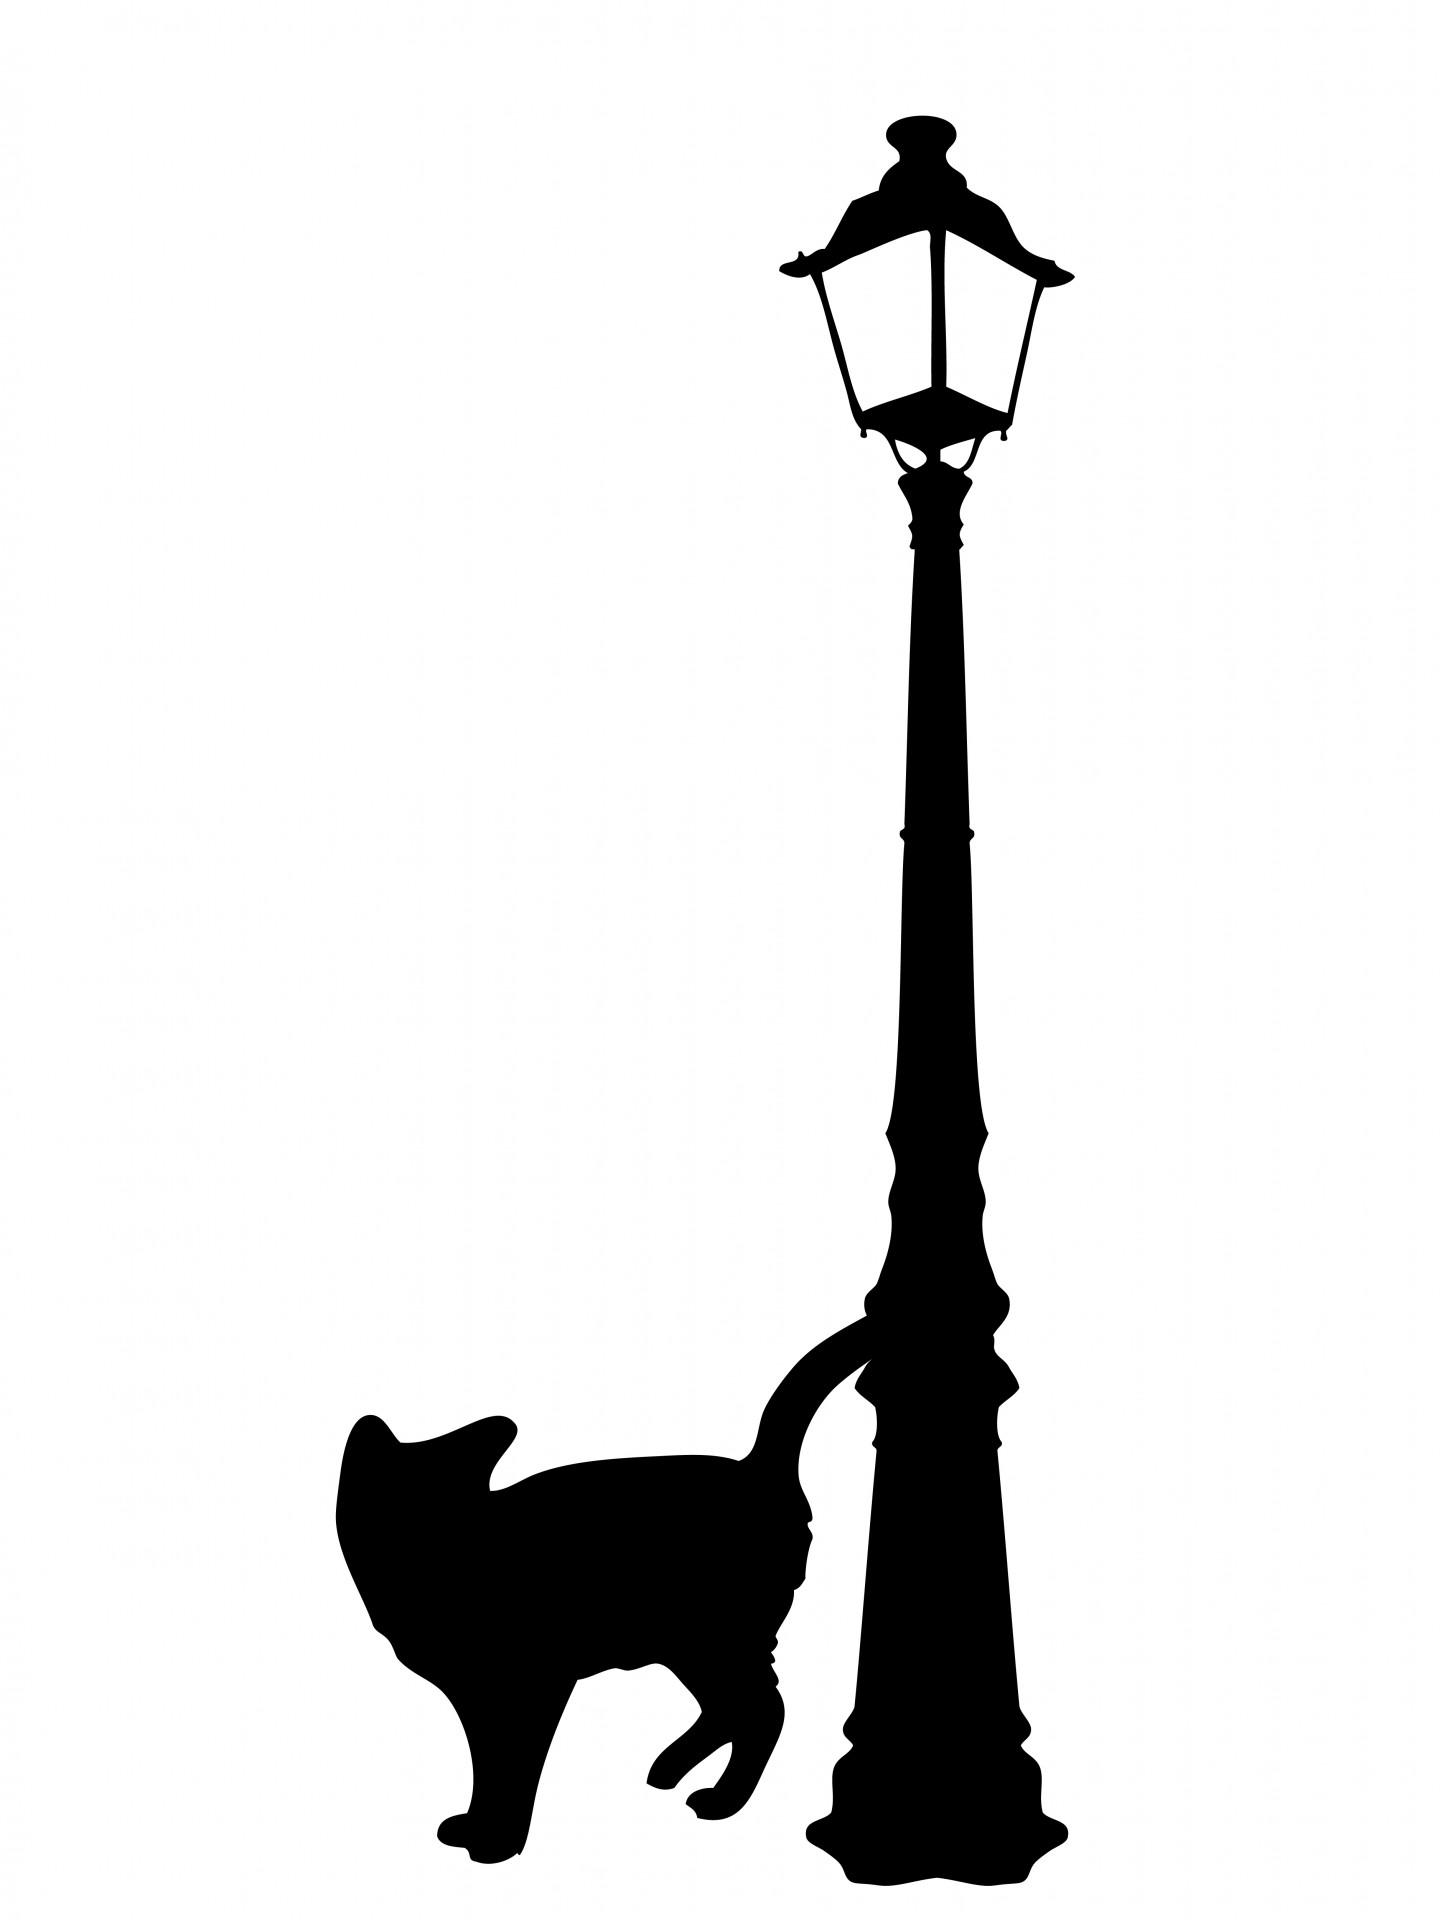 1440x1920 Black Cat Silhouette Clipart Free Stock Photo